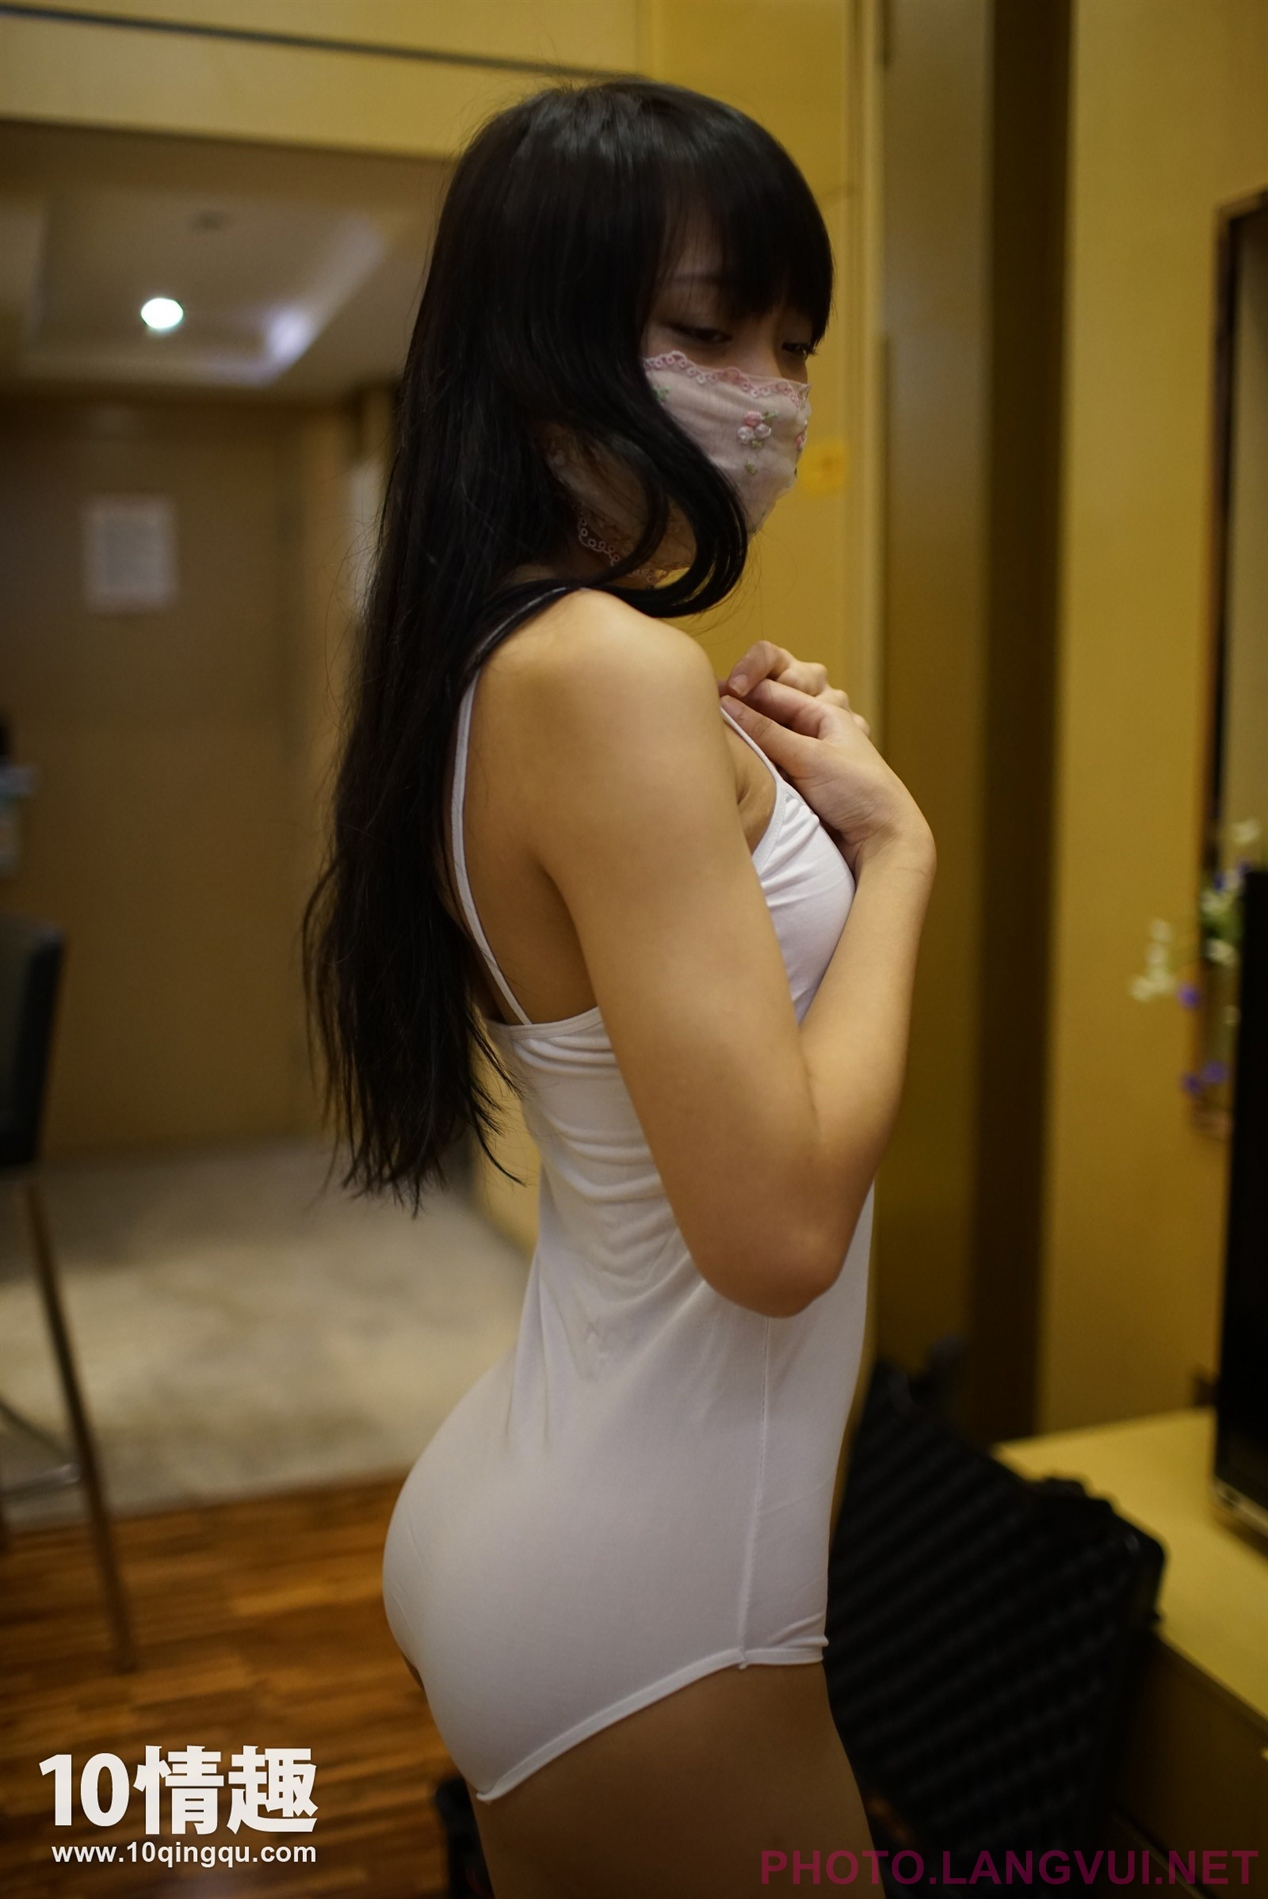 10QingQu Mask Series No 121